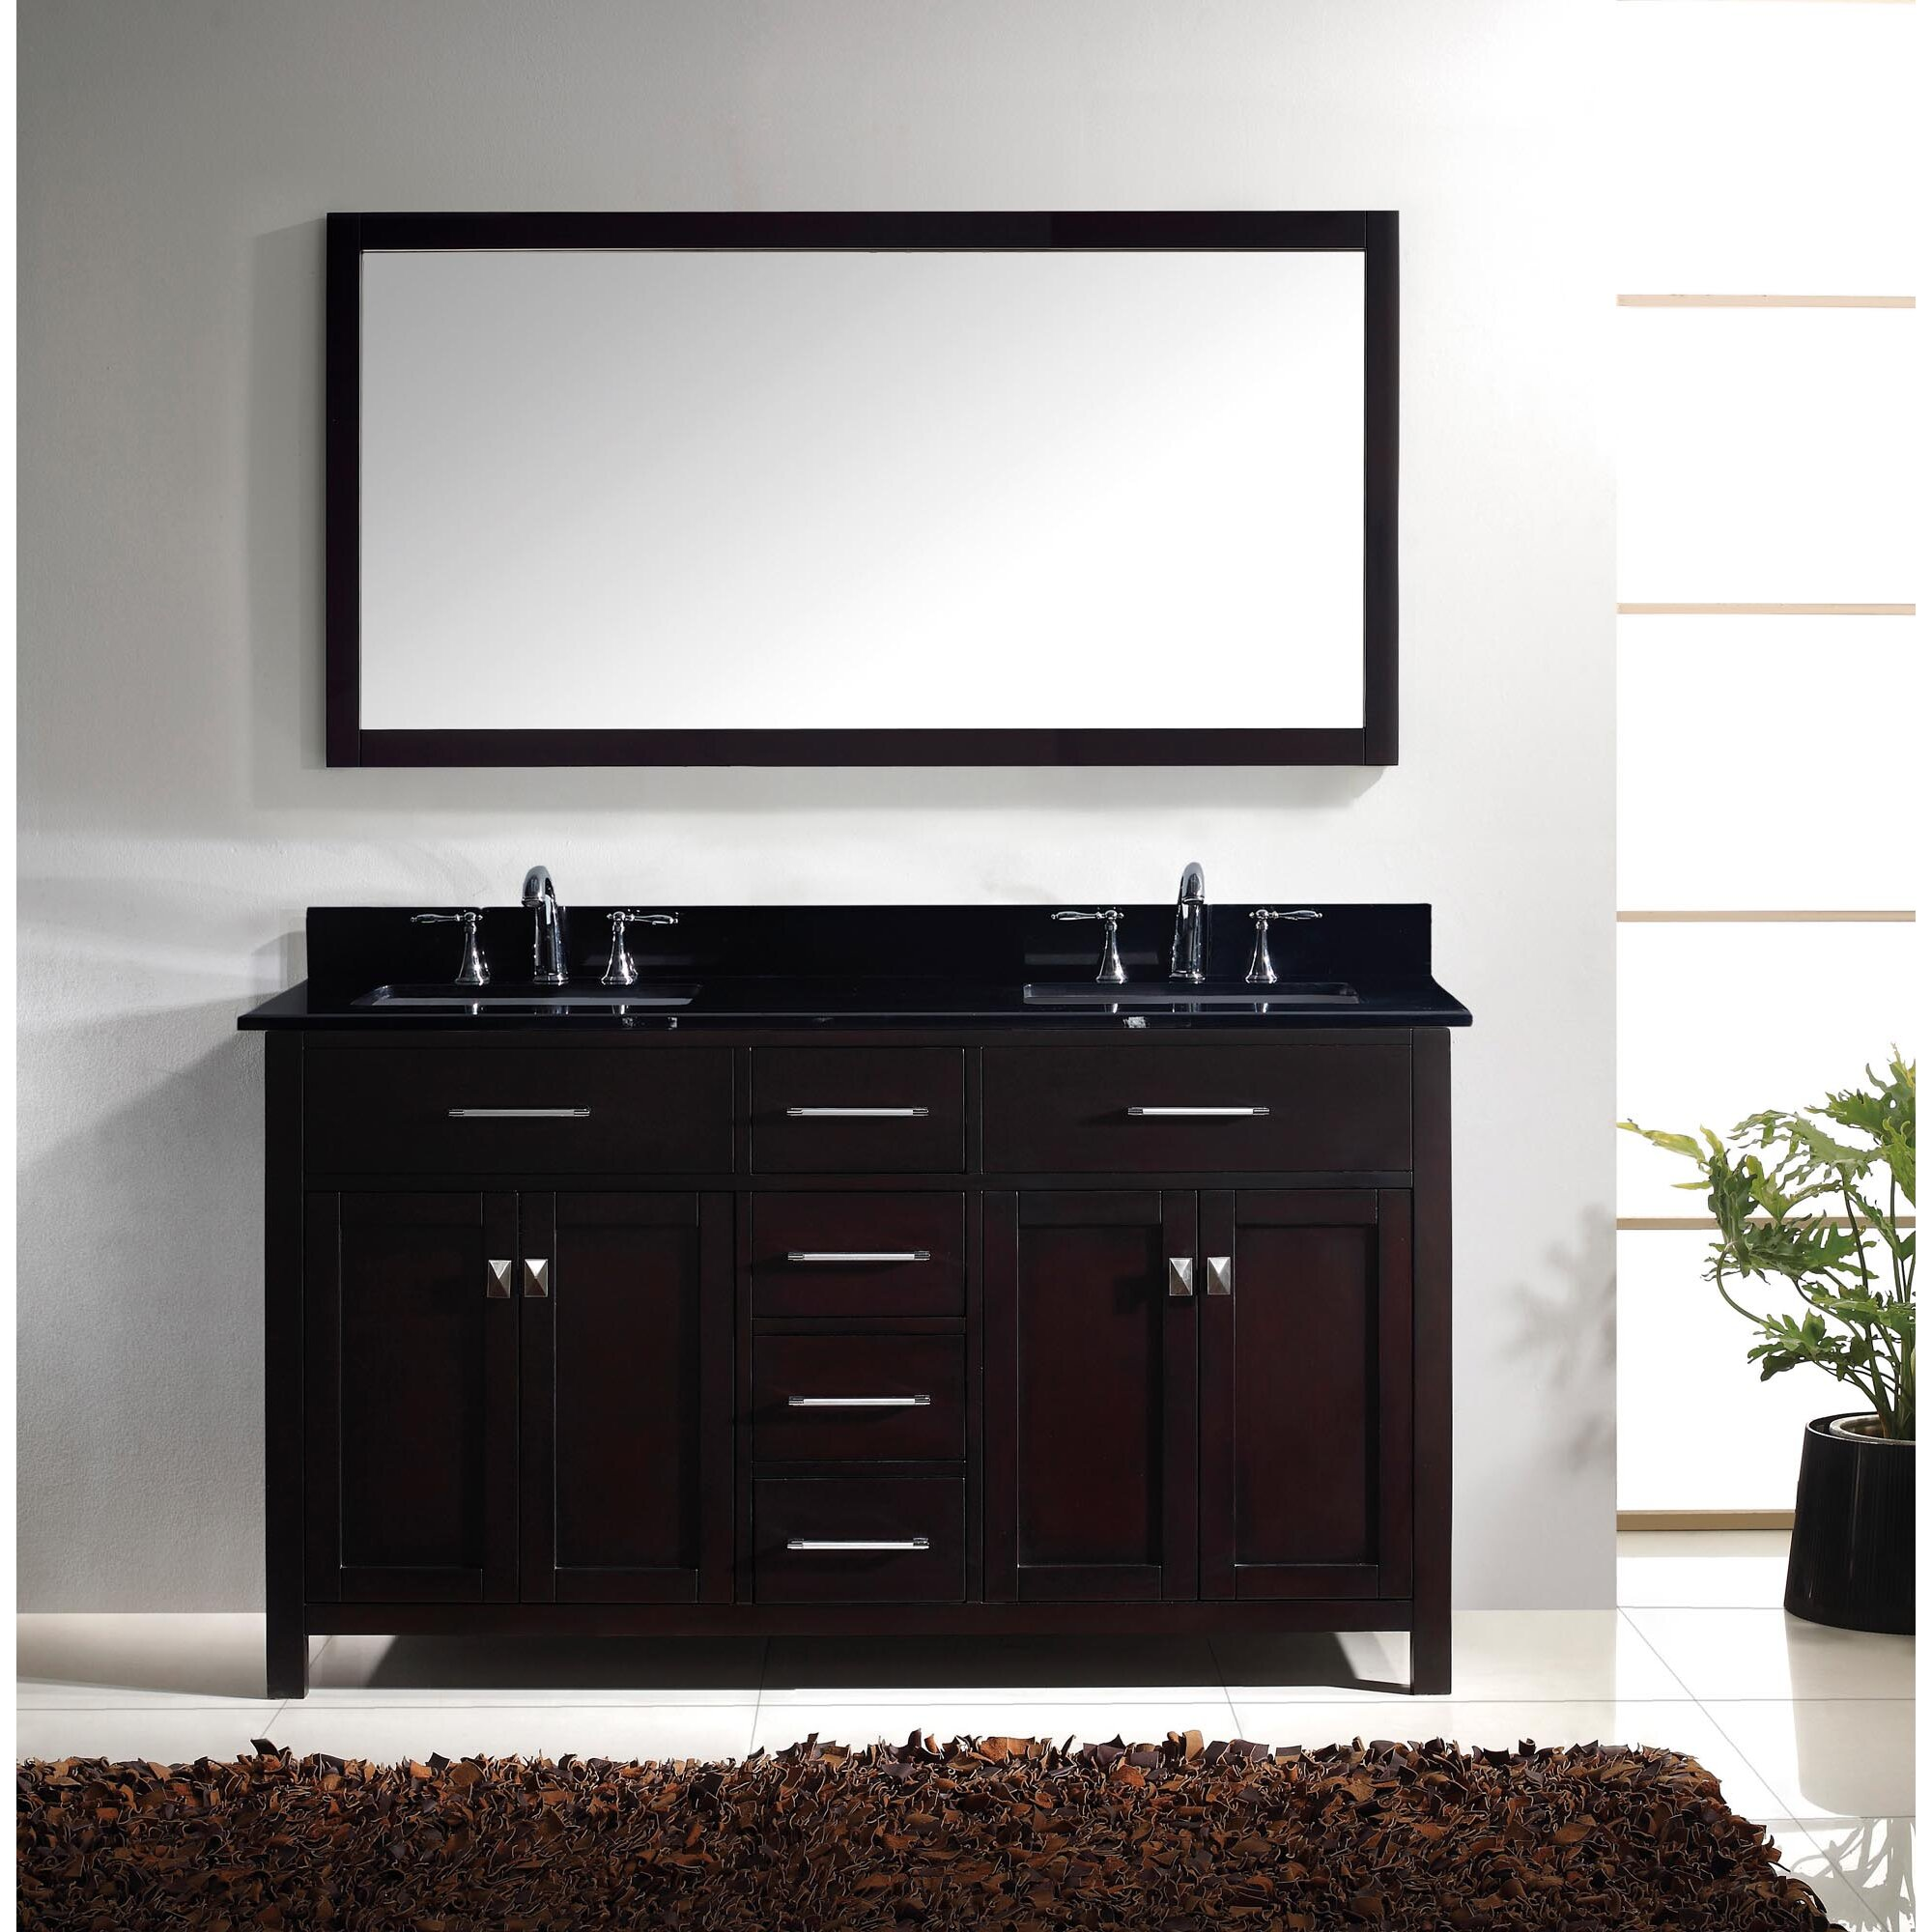 Bathroom Vanity Black Latitude Run Southwick 60 Double Bathroom Vanity Set With Black